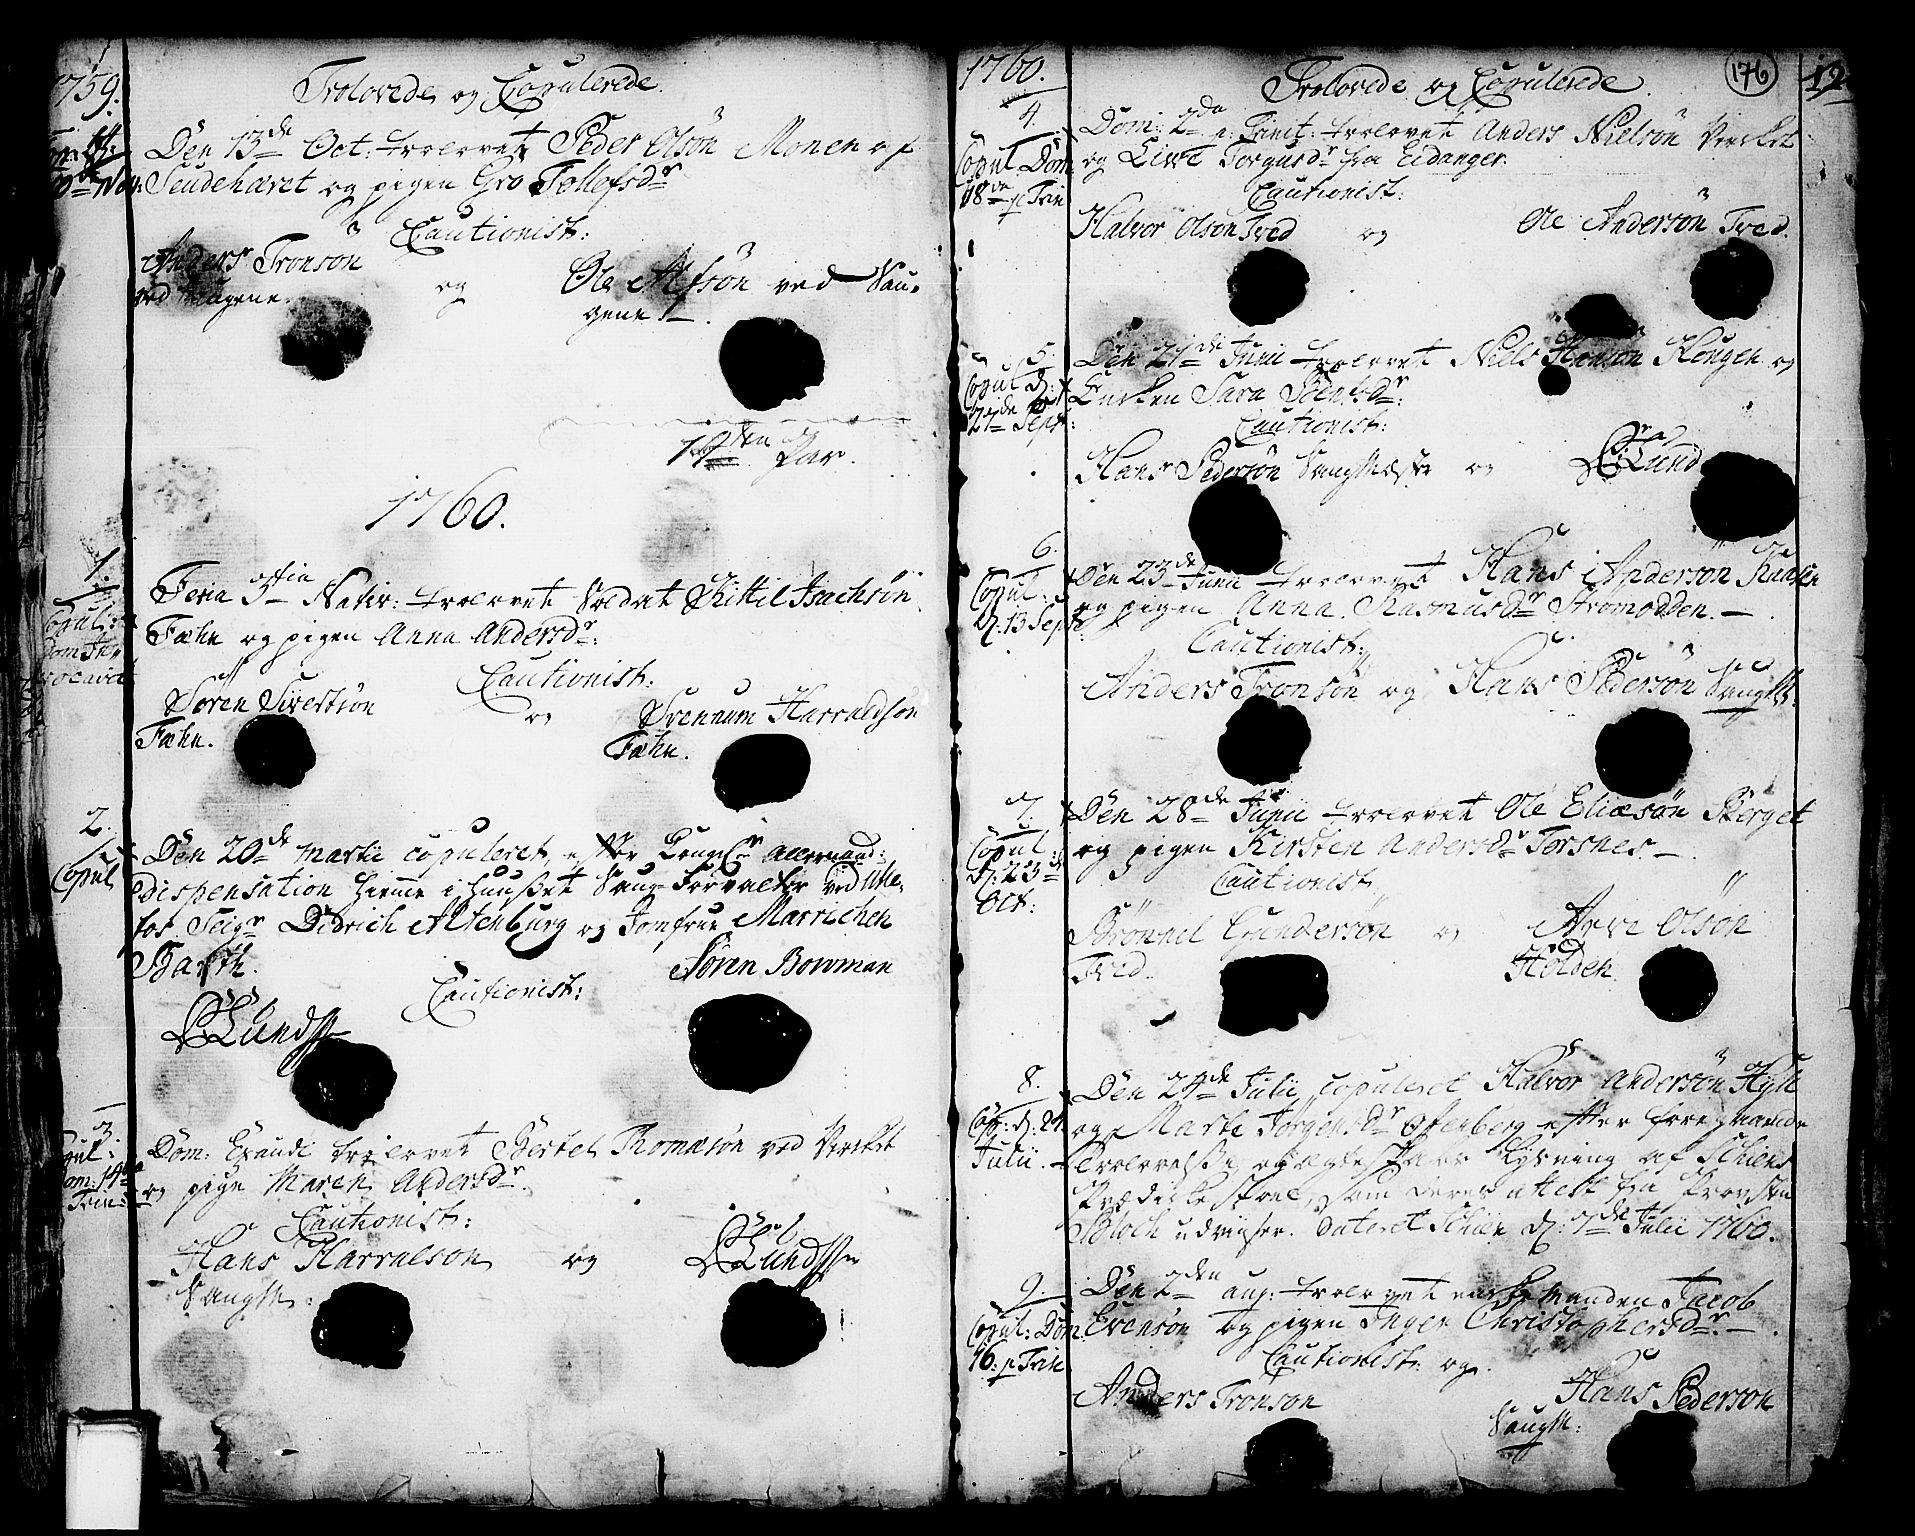 SAKO, Holla kirkebøker, F/Fa/L0001: Ministerialbok nr. 1, 1717-1779, s. 176